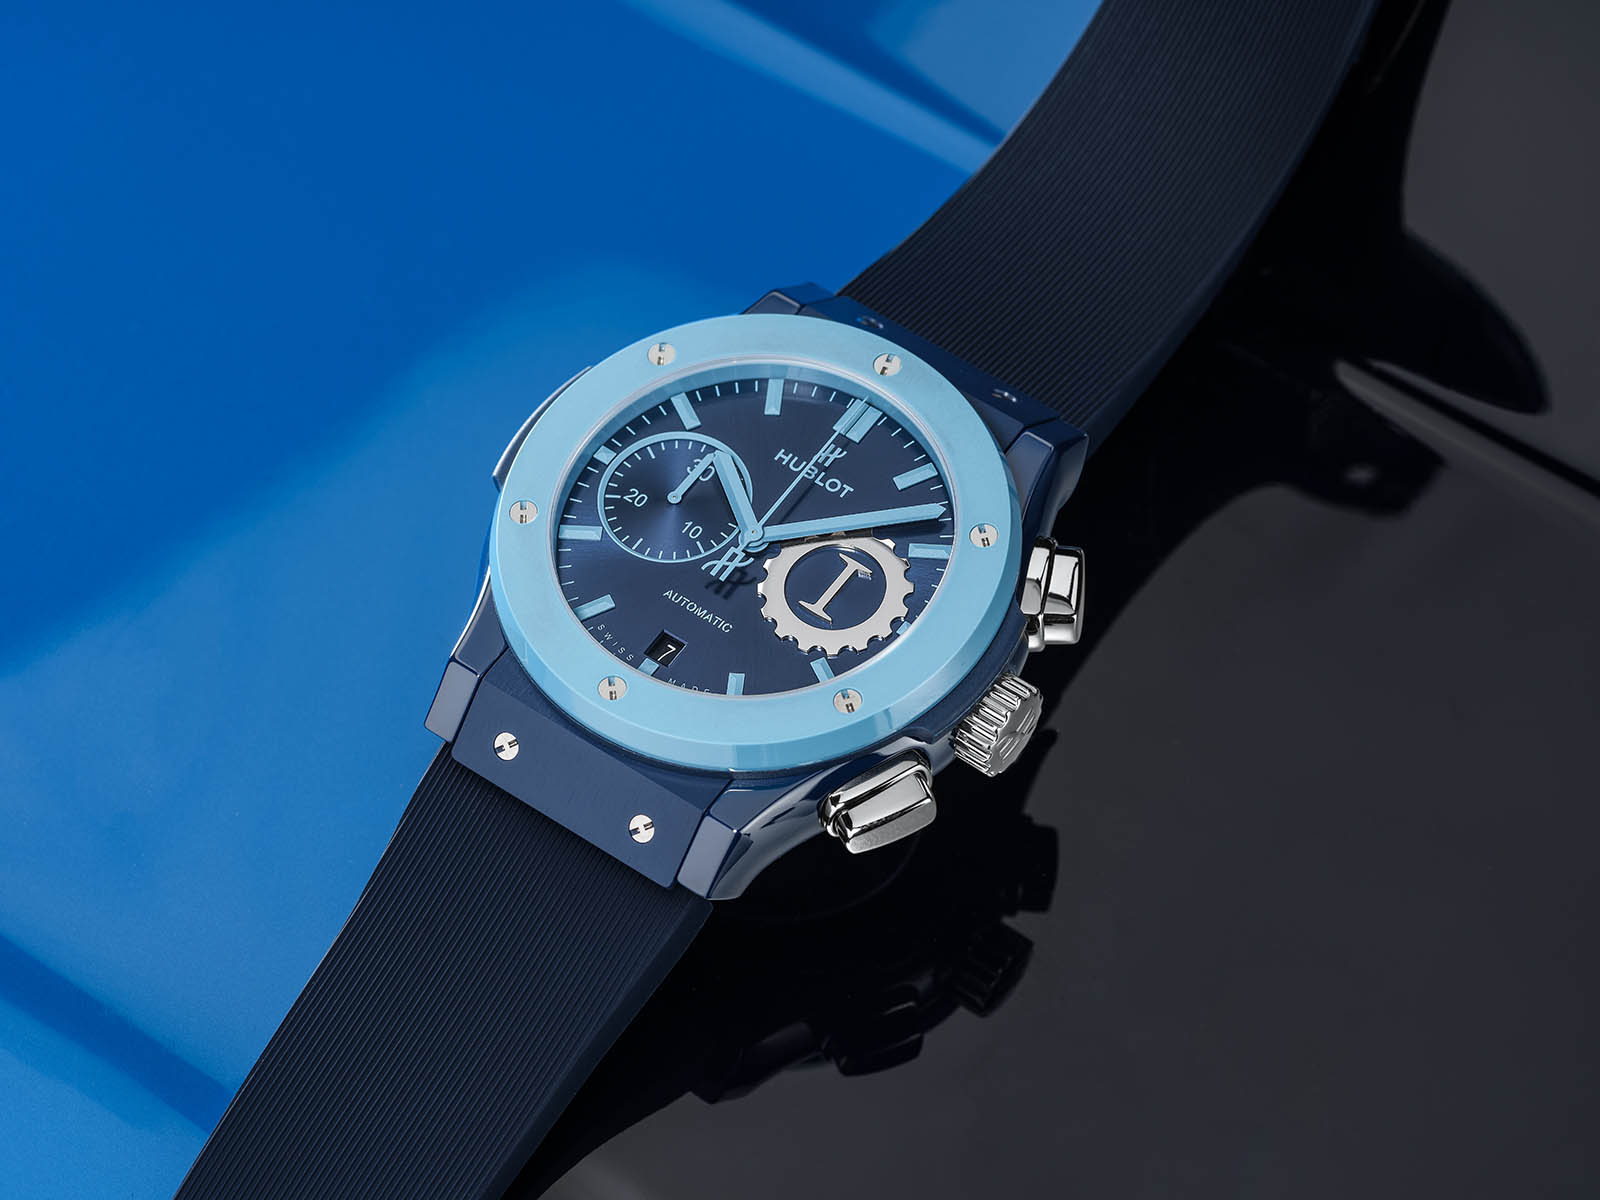 hublot-classic-fusion-chronograph-garage-italia-521-ex-7170-rx-git19-3.jpg